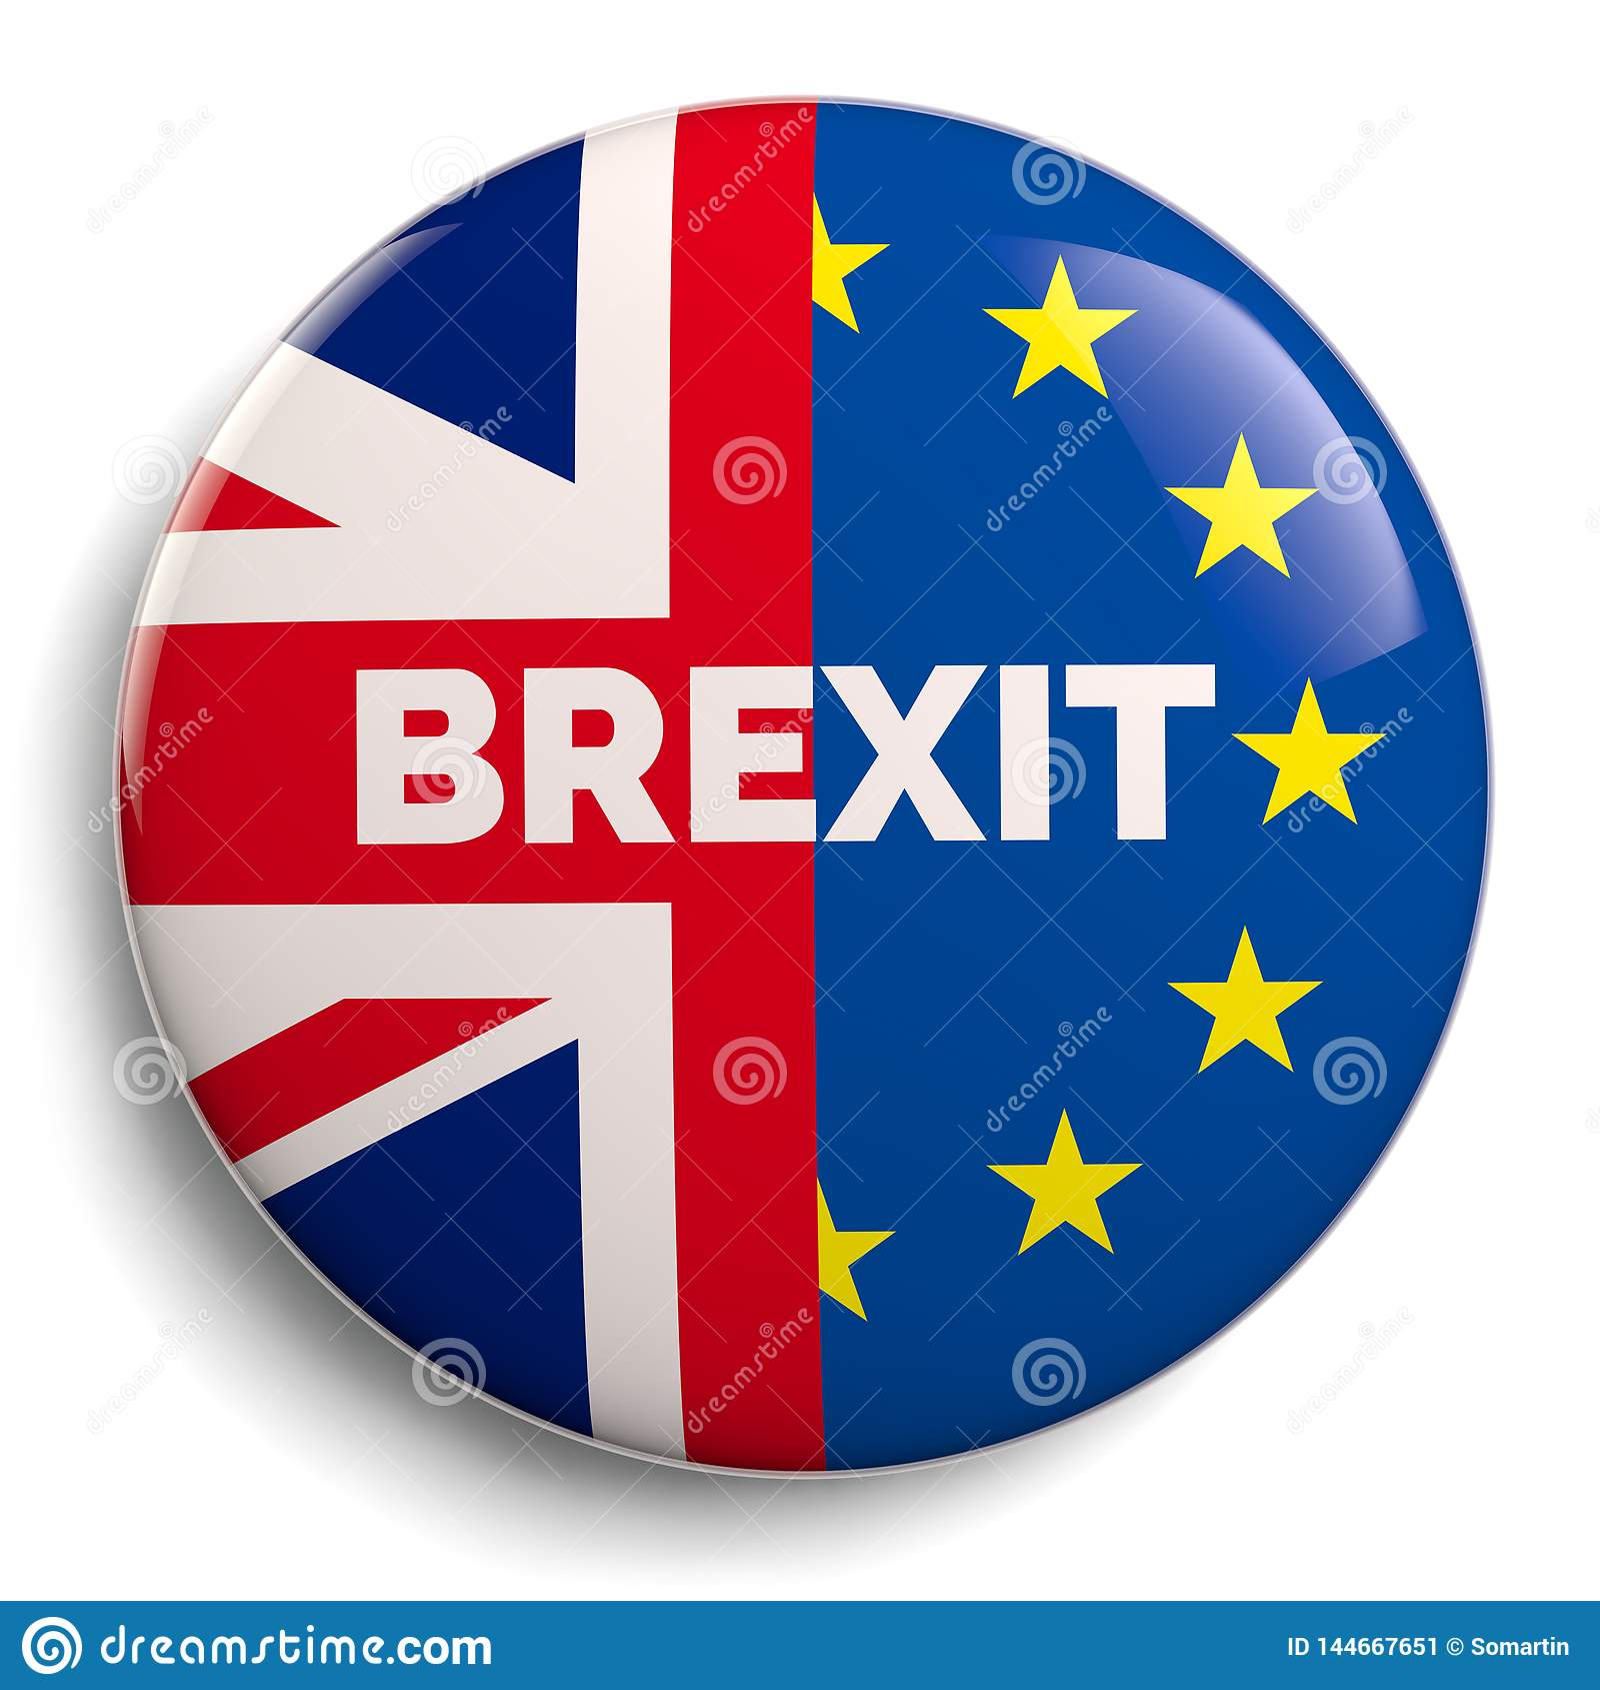 brexit-concept-uk-eu-icon-theme-british-flags-button-badge-144667651.jpg?profile=RESIZE_400x